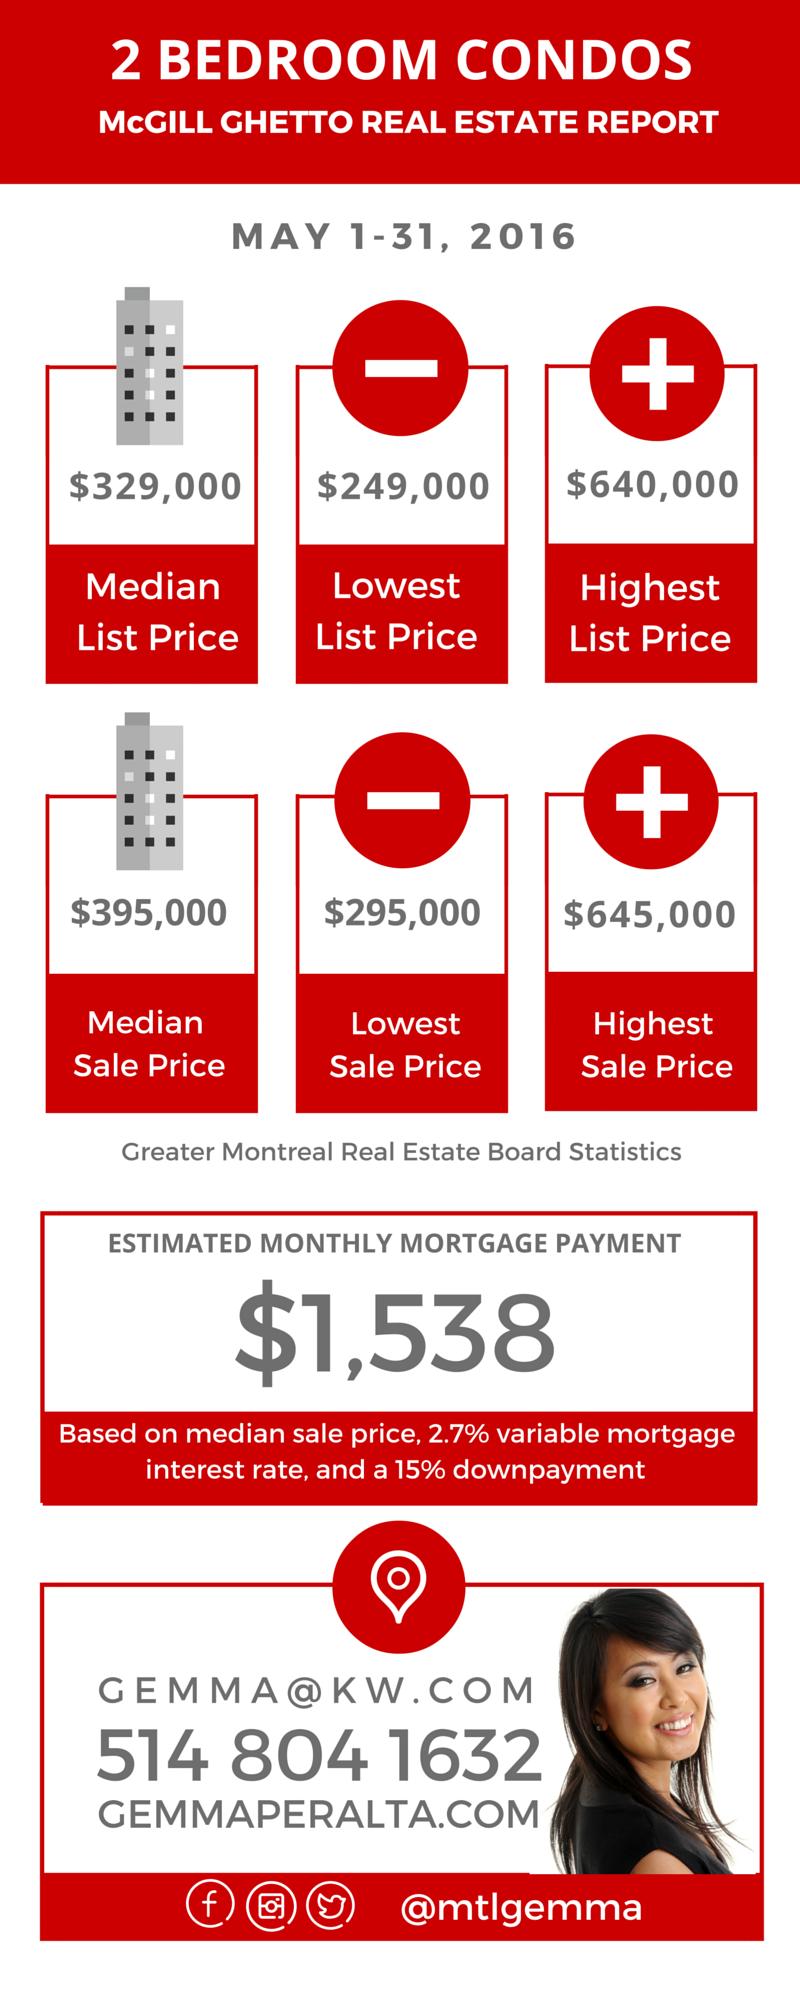 McGill Ghetto Real Estate Report May 2016 03